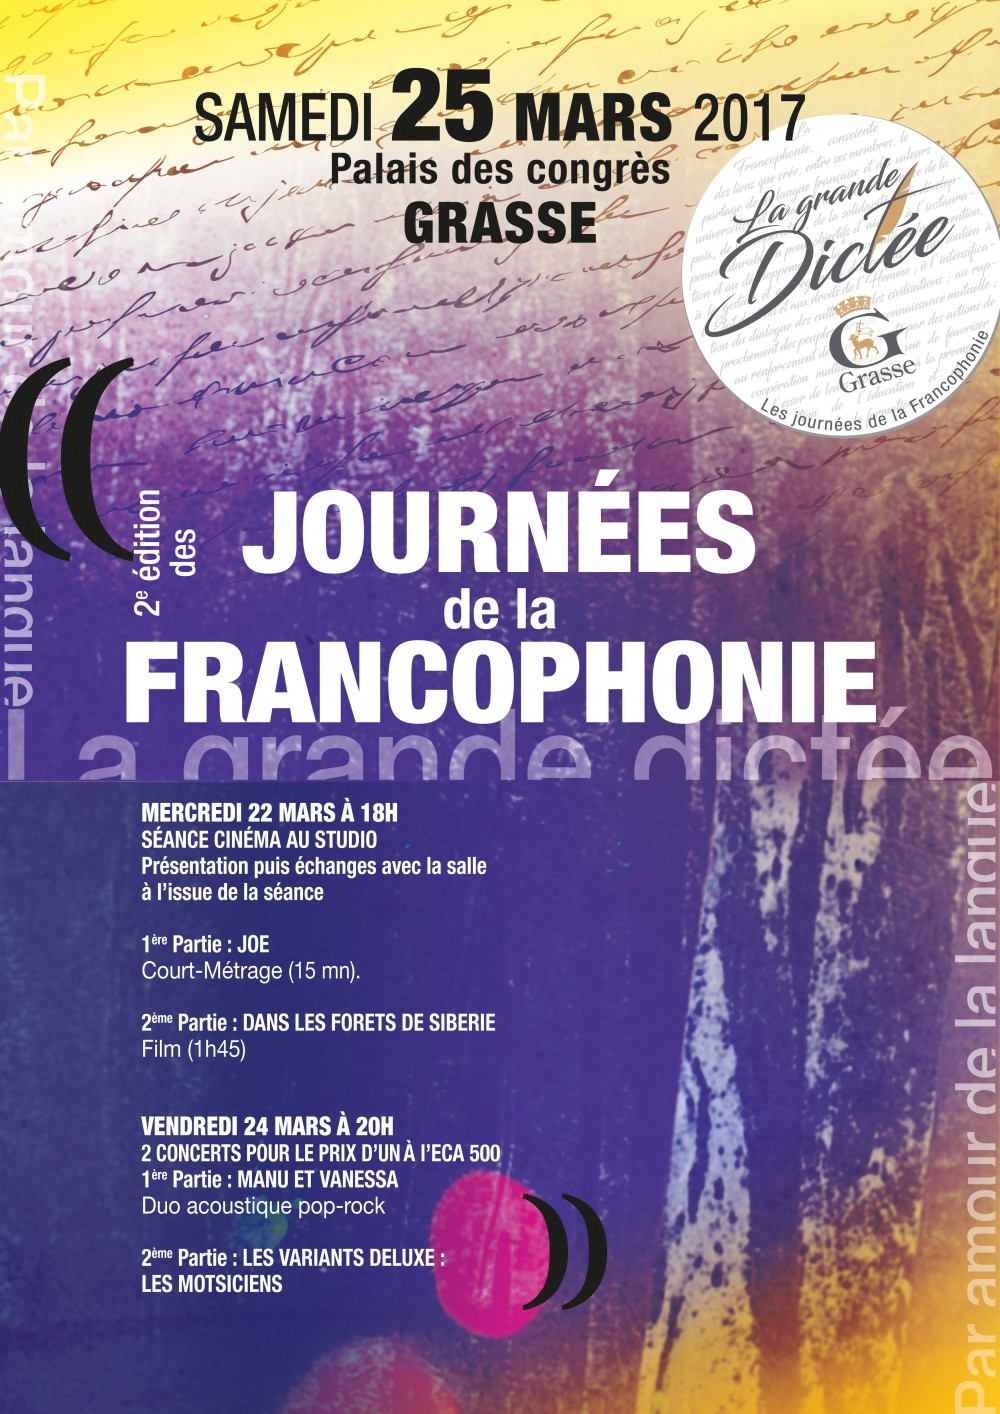 francophonie (2)